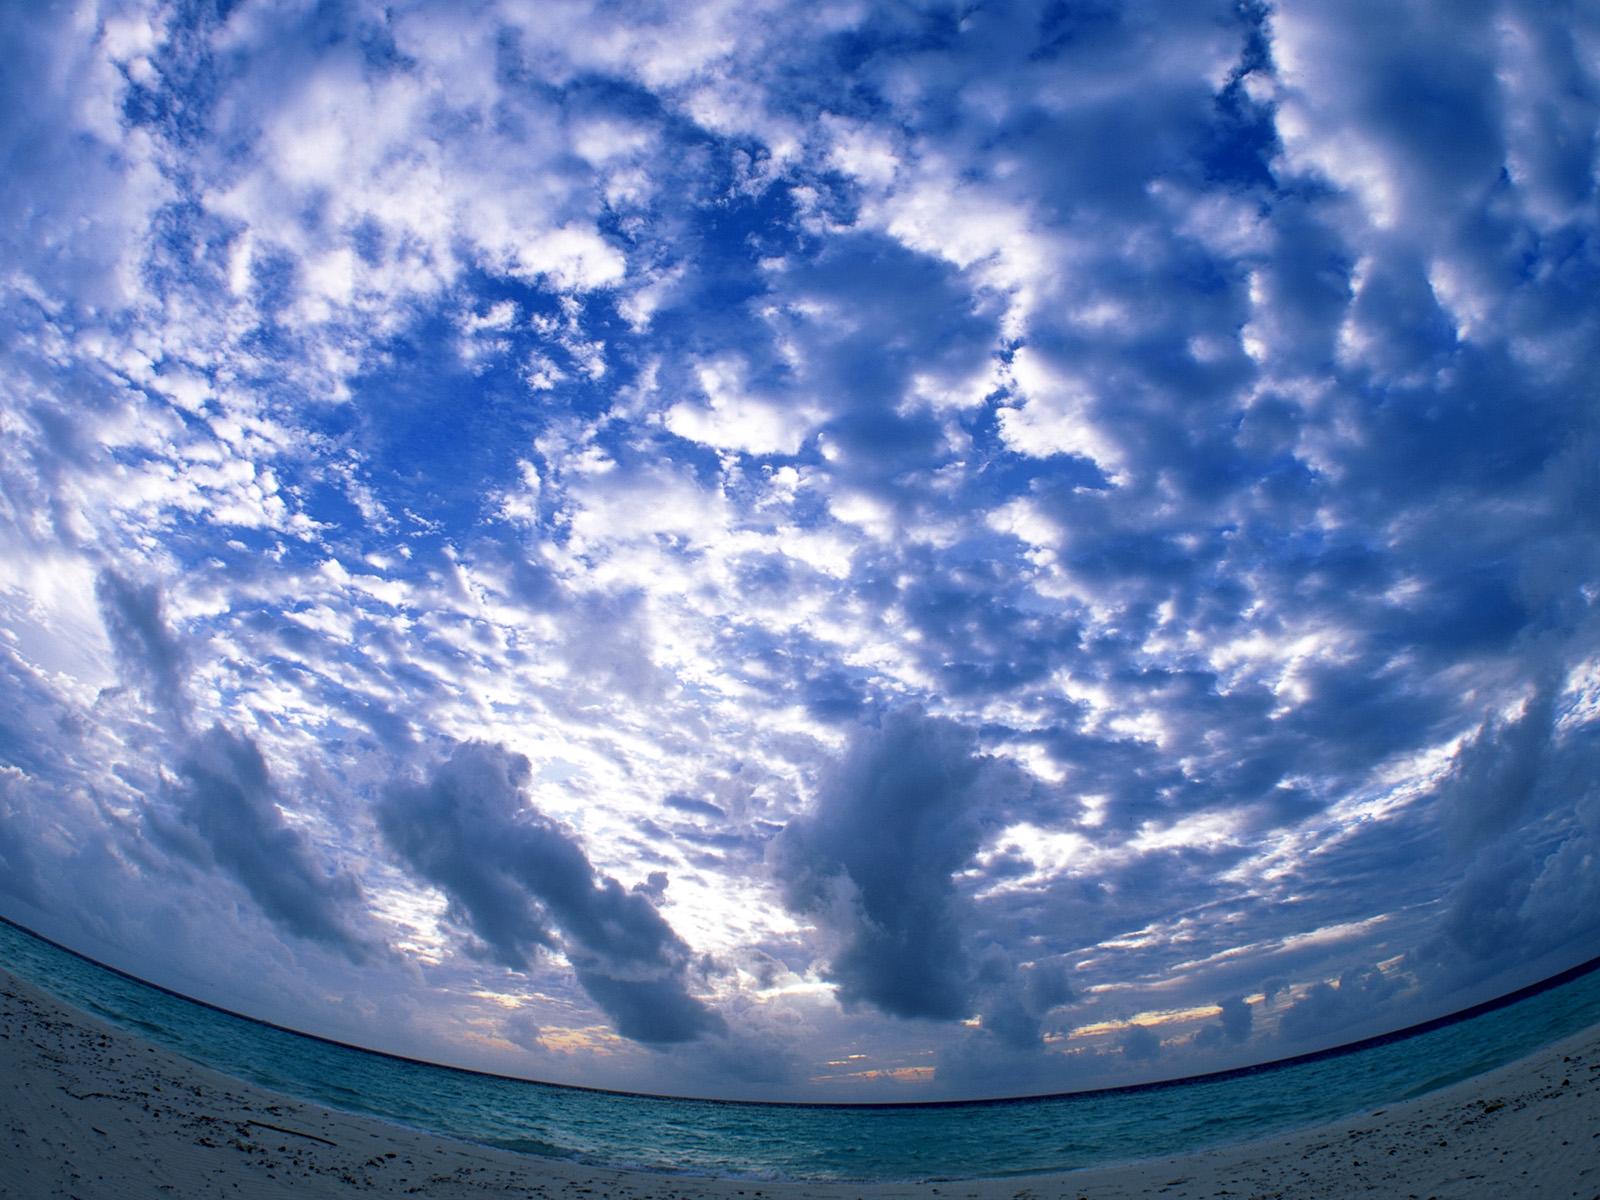 Wallpapers Unseen Beutiful Sky Water Cloud Hd Desktop Wallpapers 1600x1200